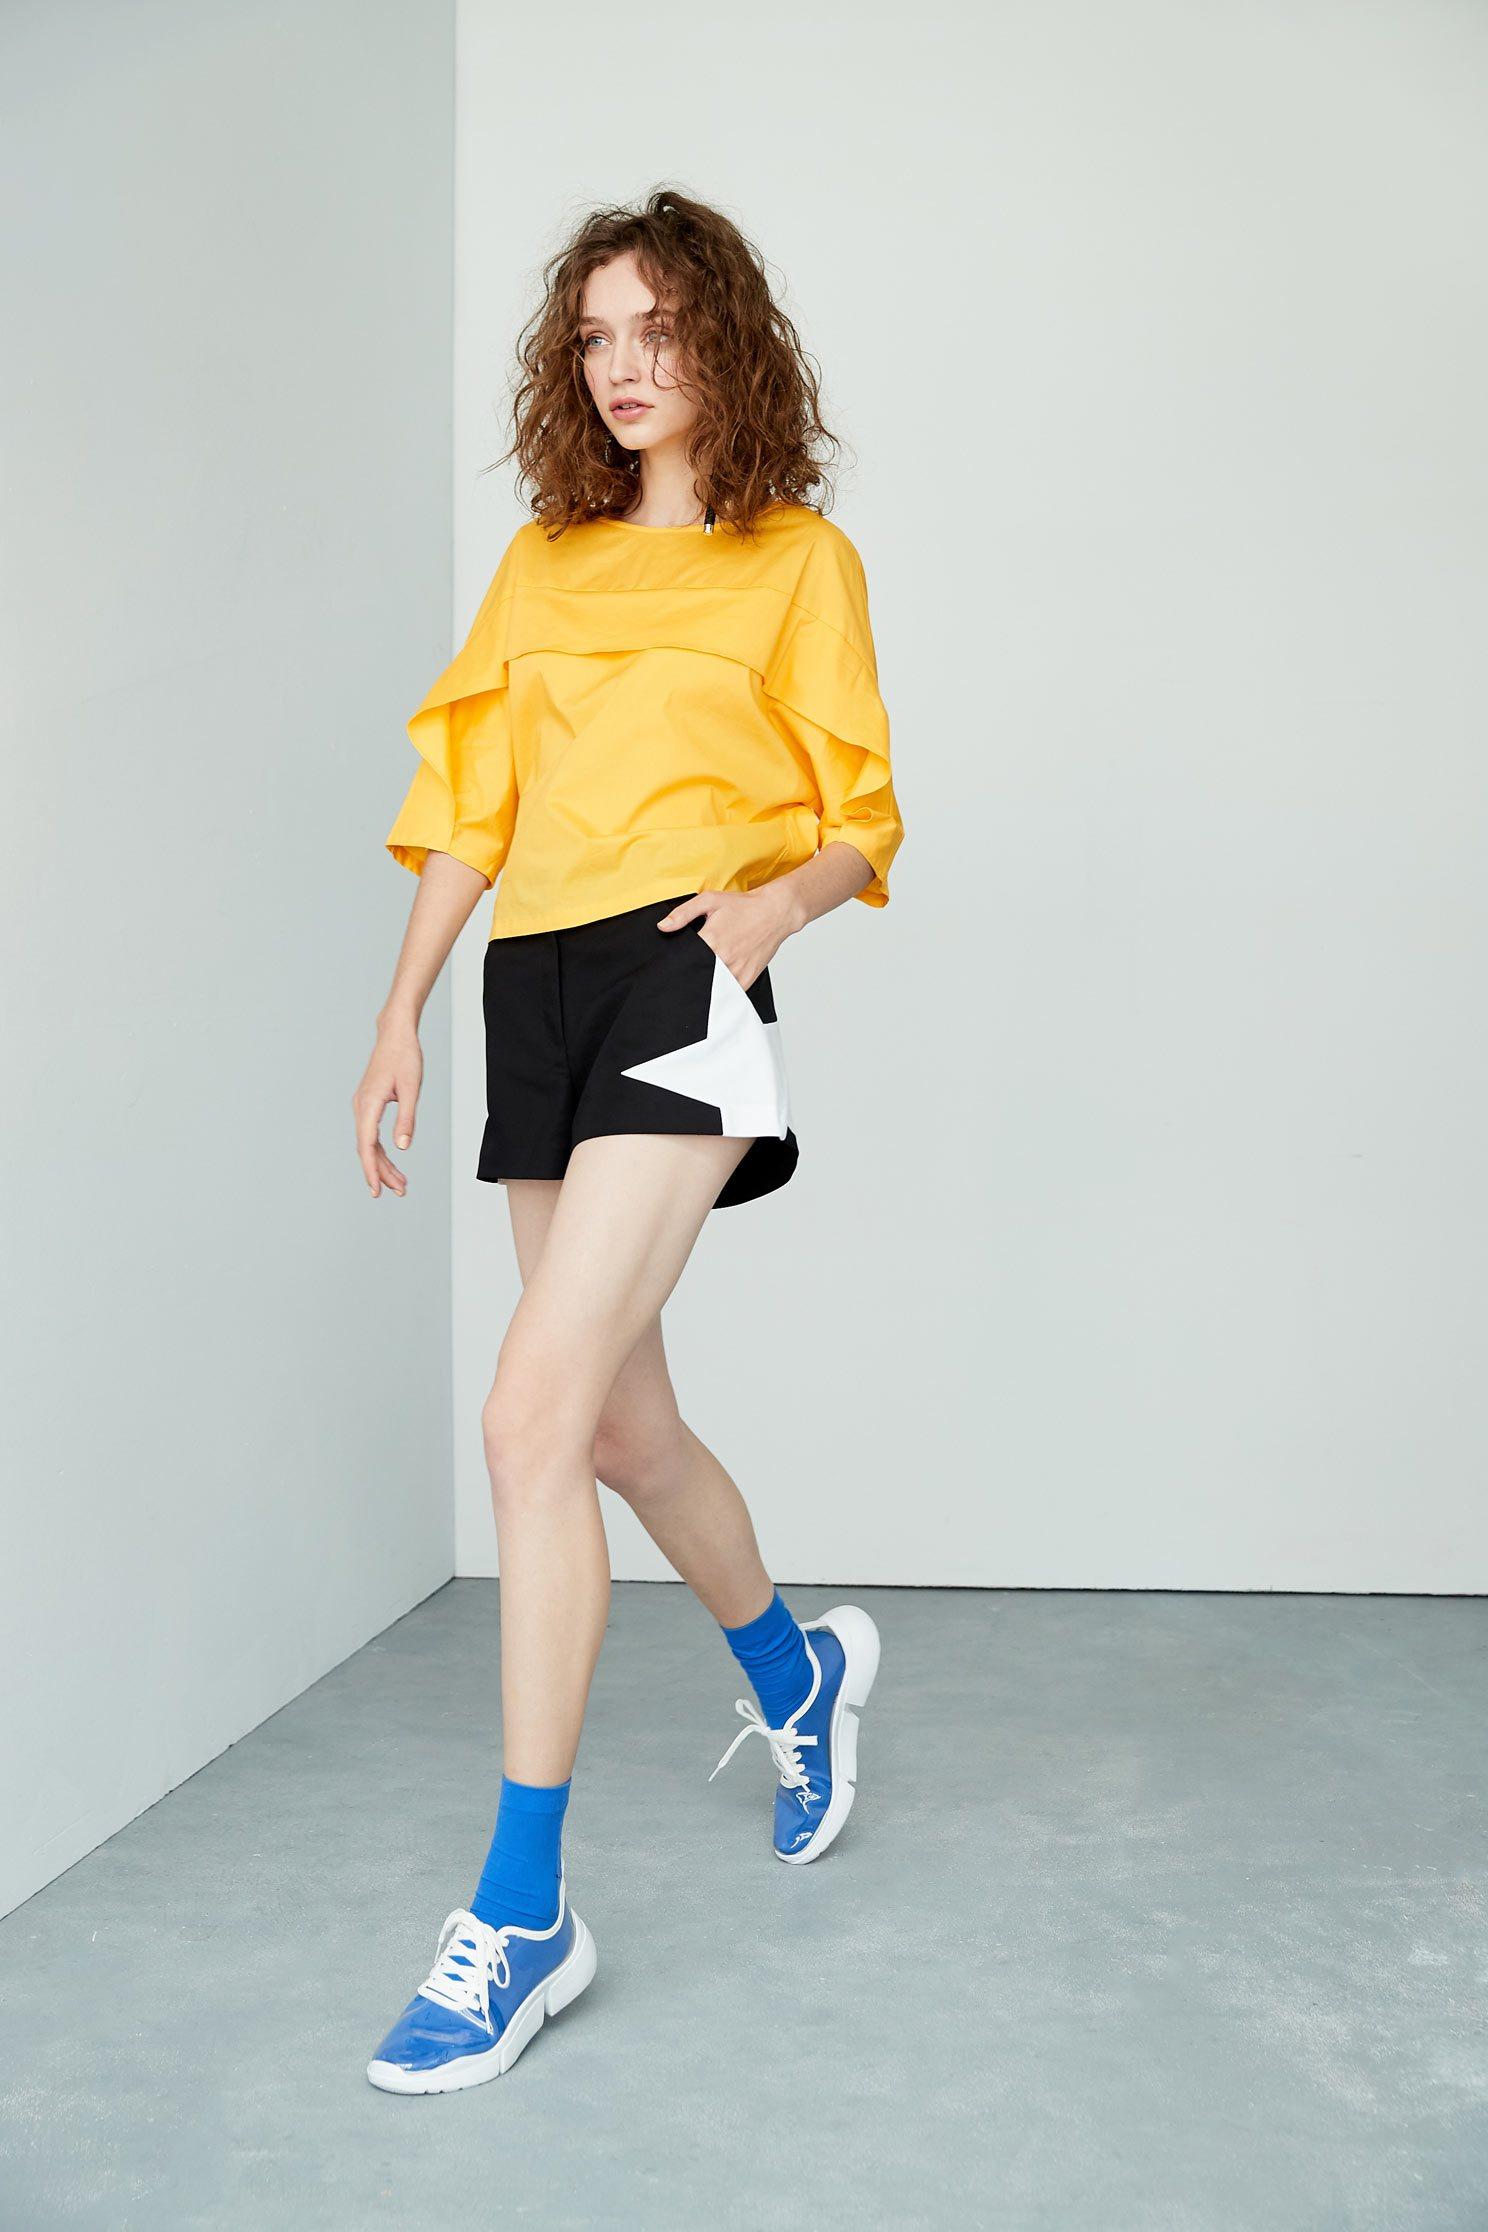 Temperament three-quarter sleeve top,七分袖上衣,Top,圓領上衣,Cotton